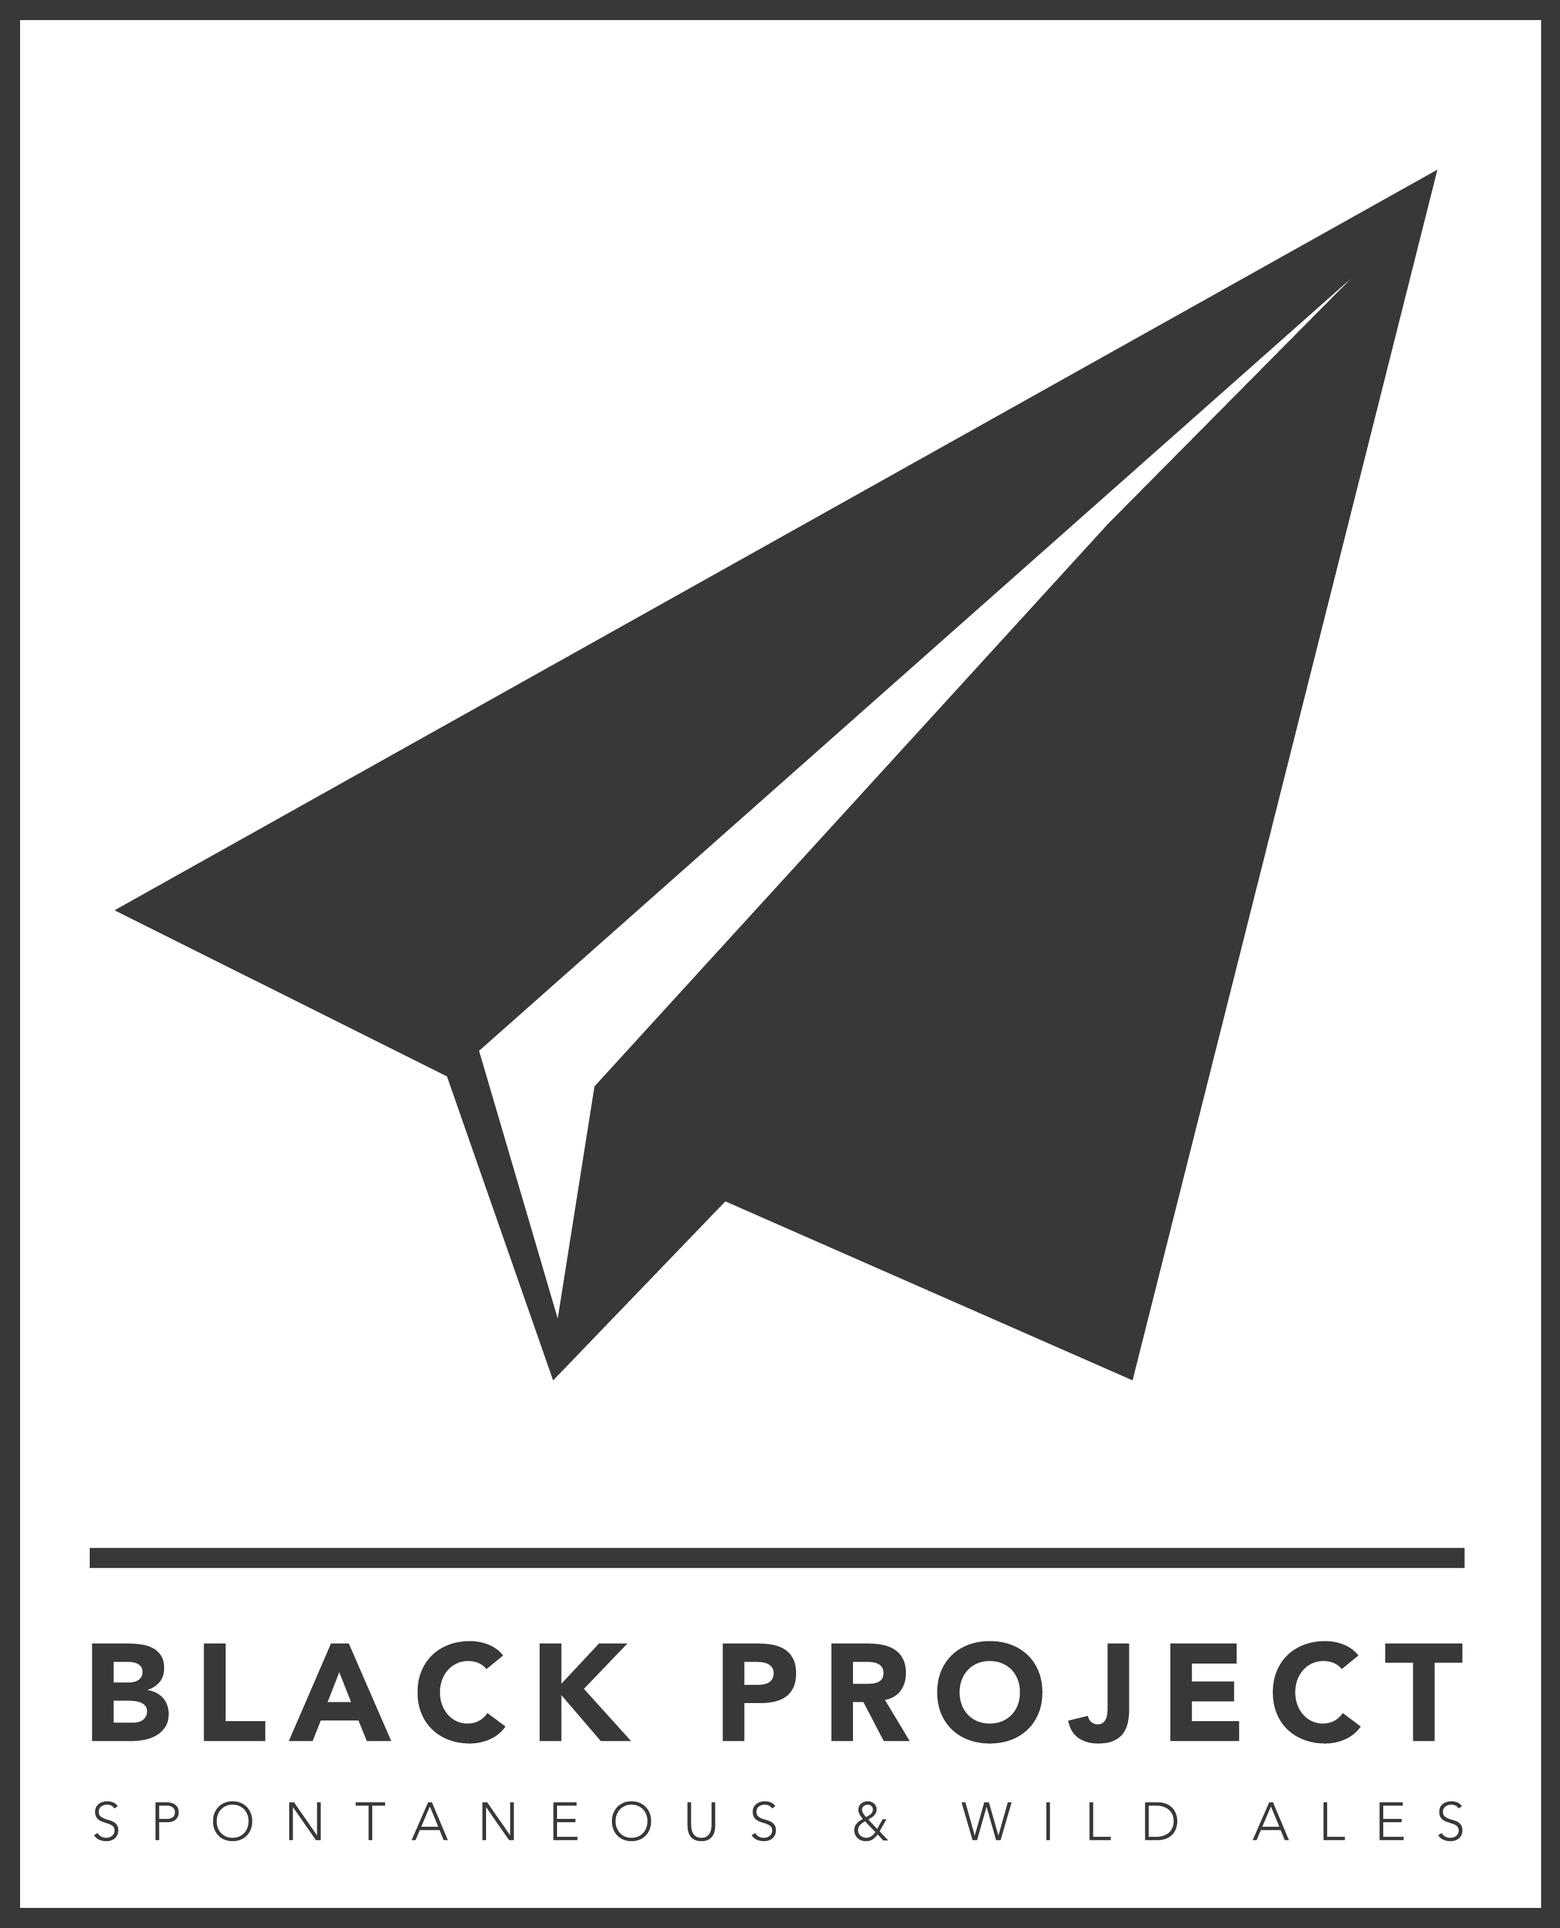 Black Project Spontaneous & Wild Ales Logo